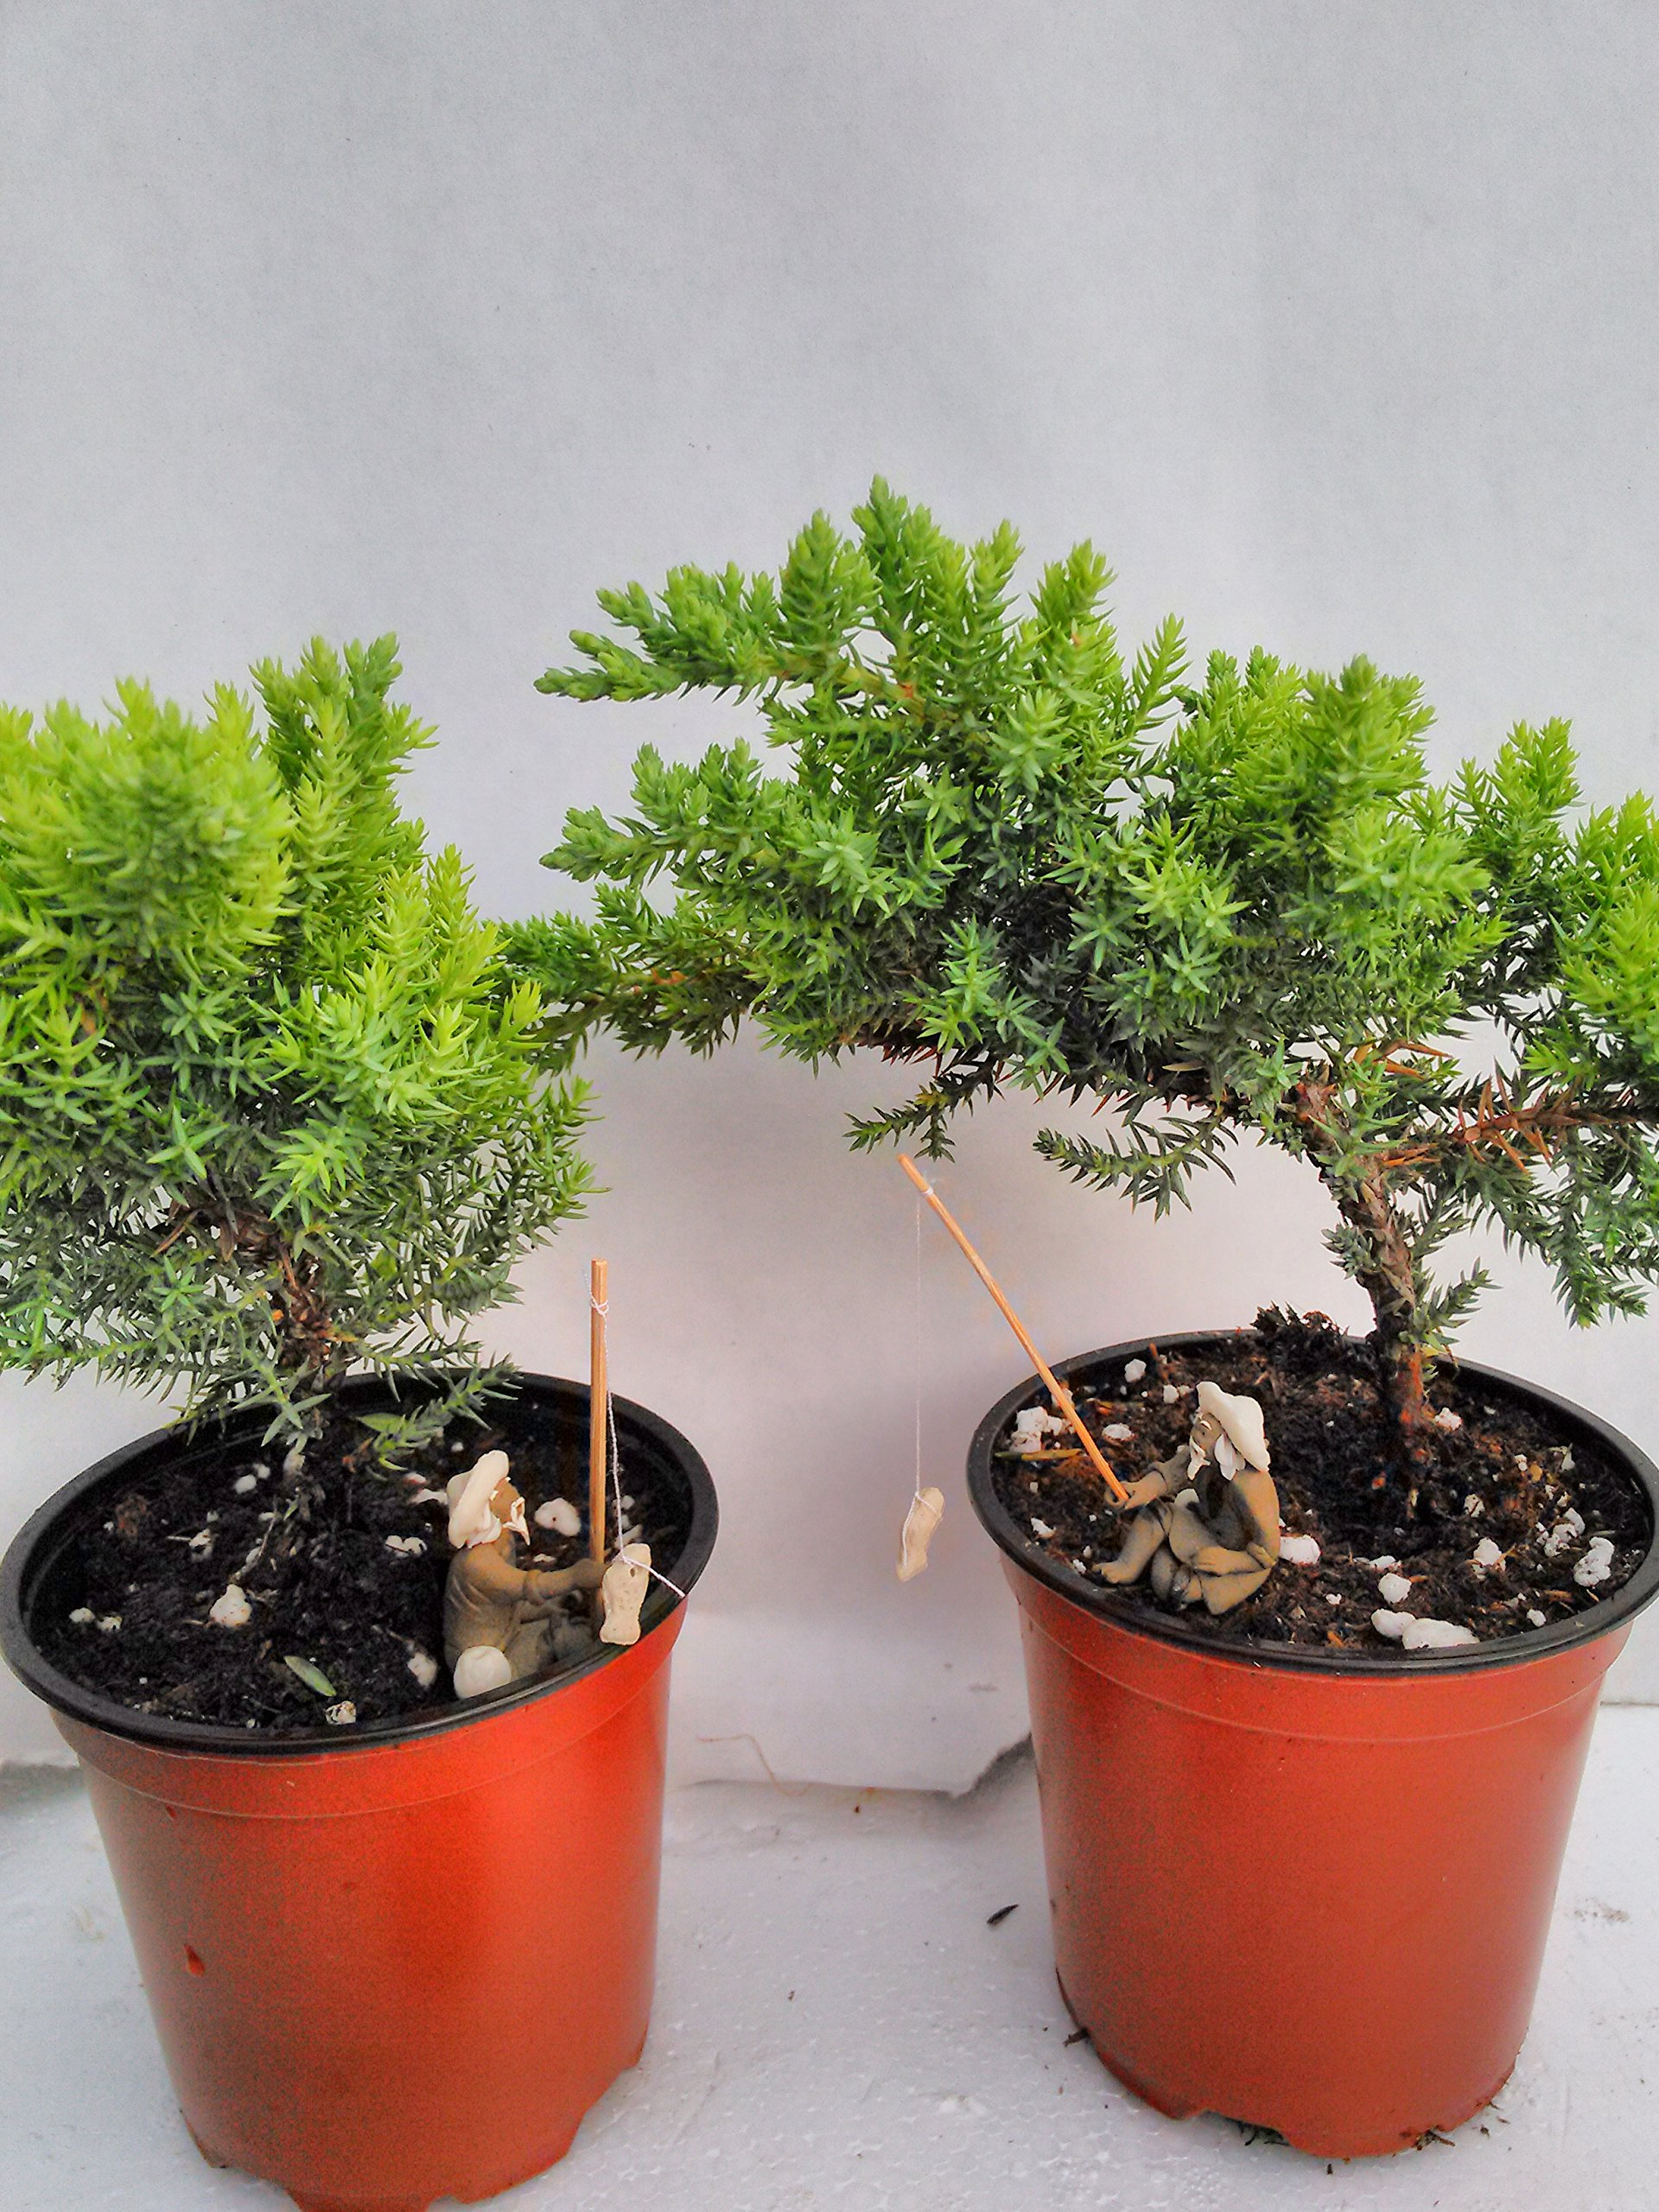 Jmbamboo - Two Tree Bonsai Juniper Garden 4'' Pot with Fishman by JM BAMBOO